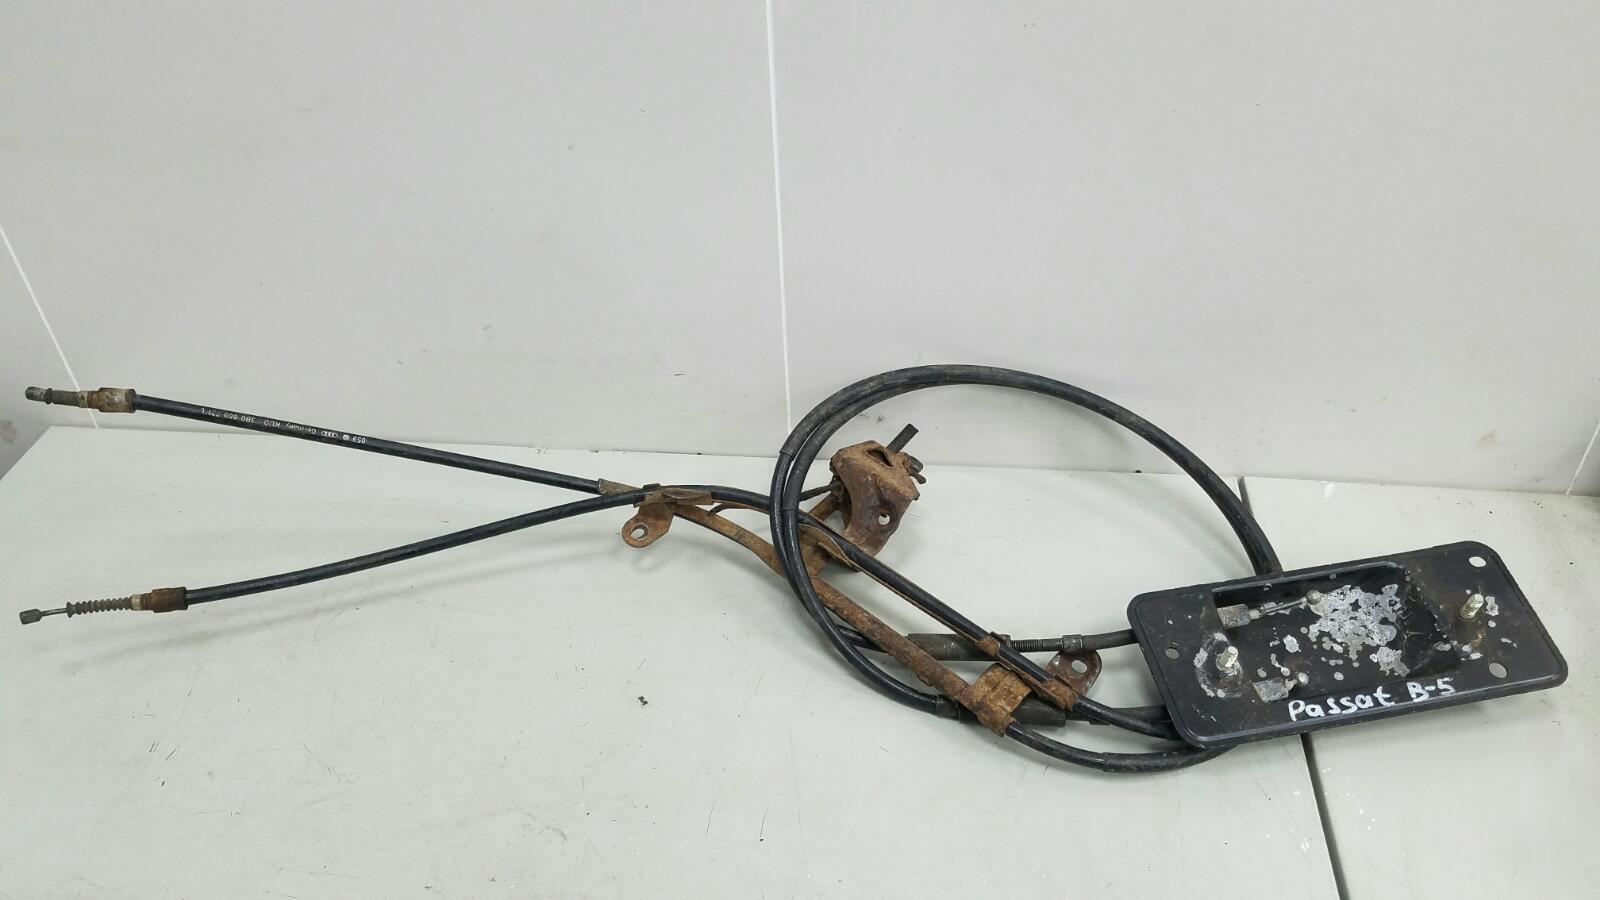 Трос ручного стояночного тормоза ручника Volkswagen Passat 3B5 ACK 1998г